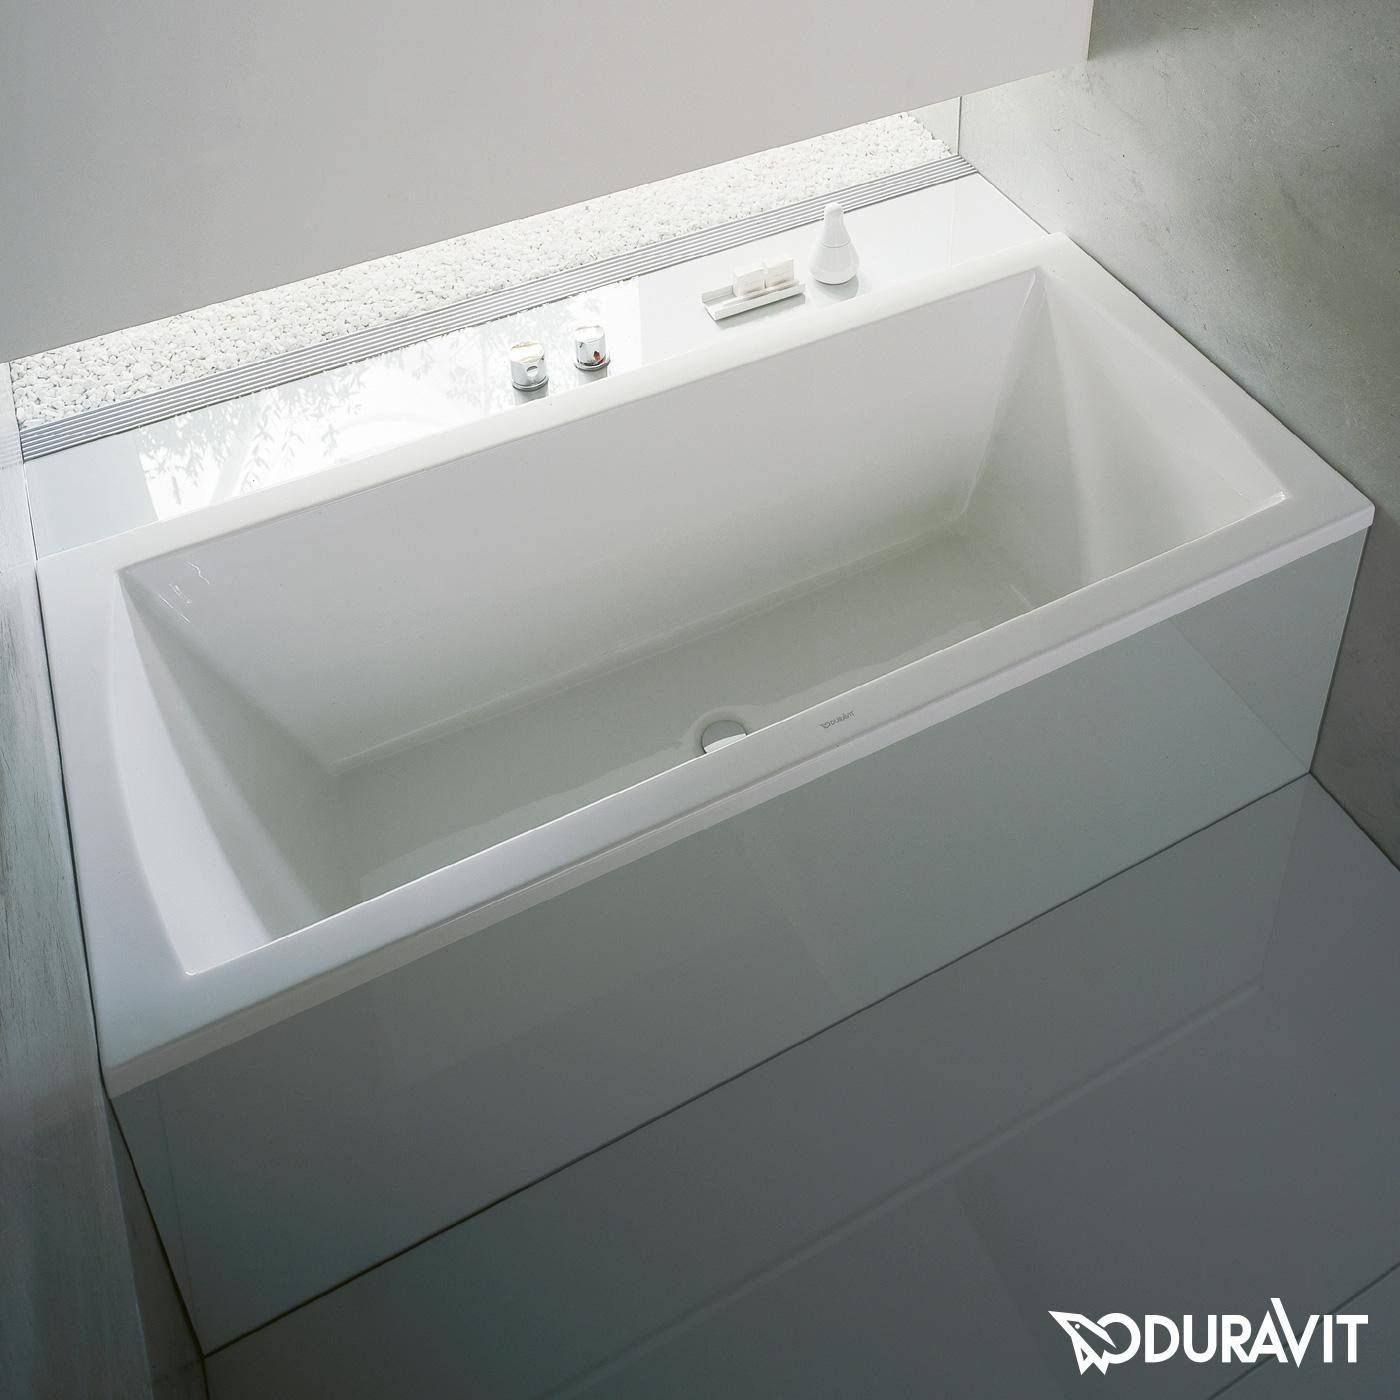 duravit daro rechteck badewanne 700028000000000 reuter. Black Bedroom Furniture Sets. Home Design Ideas